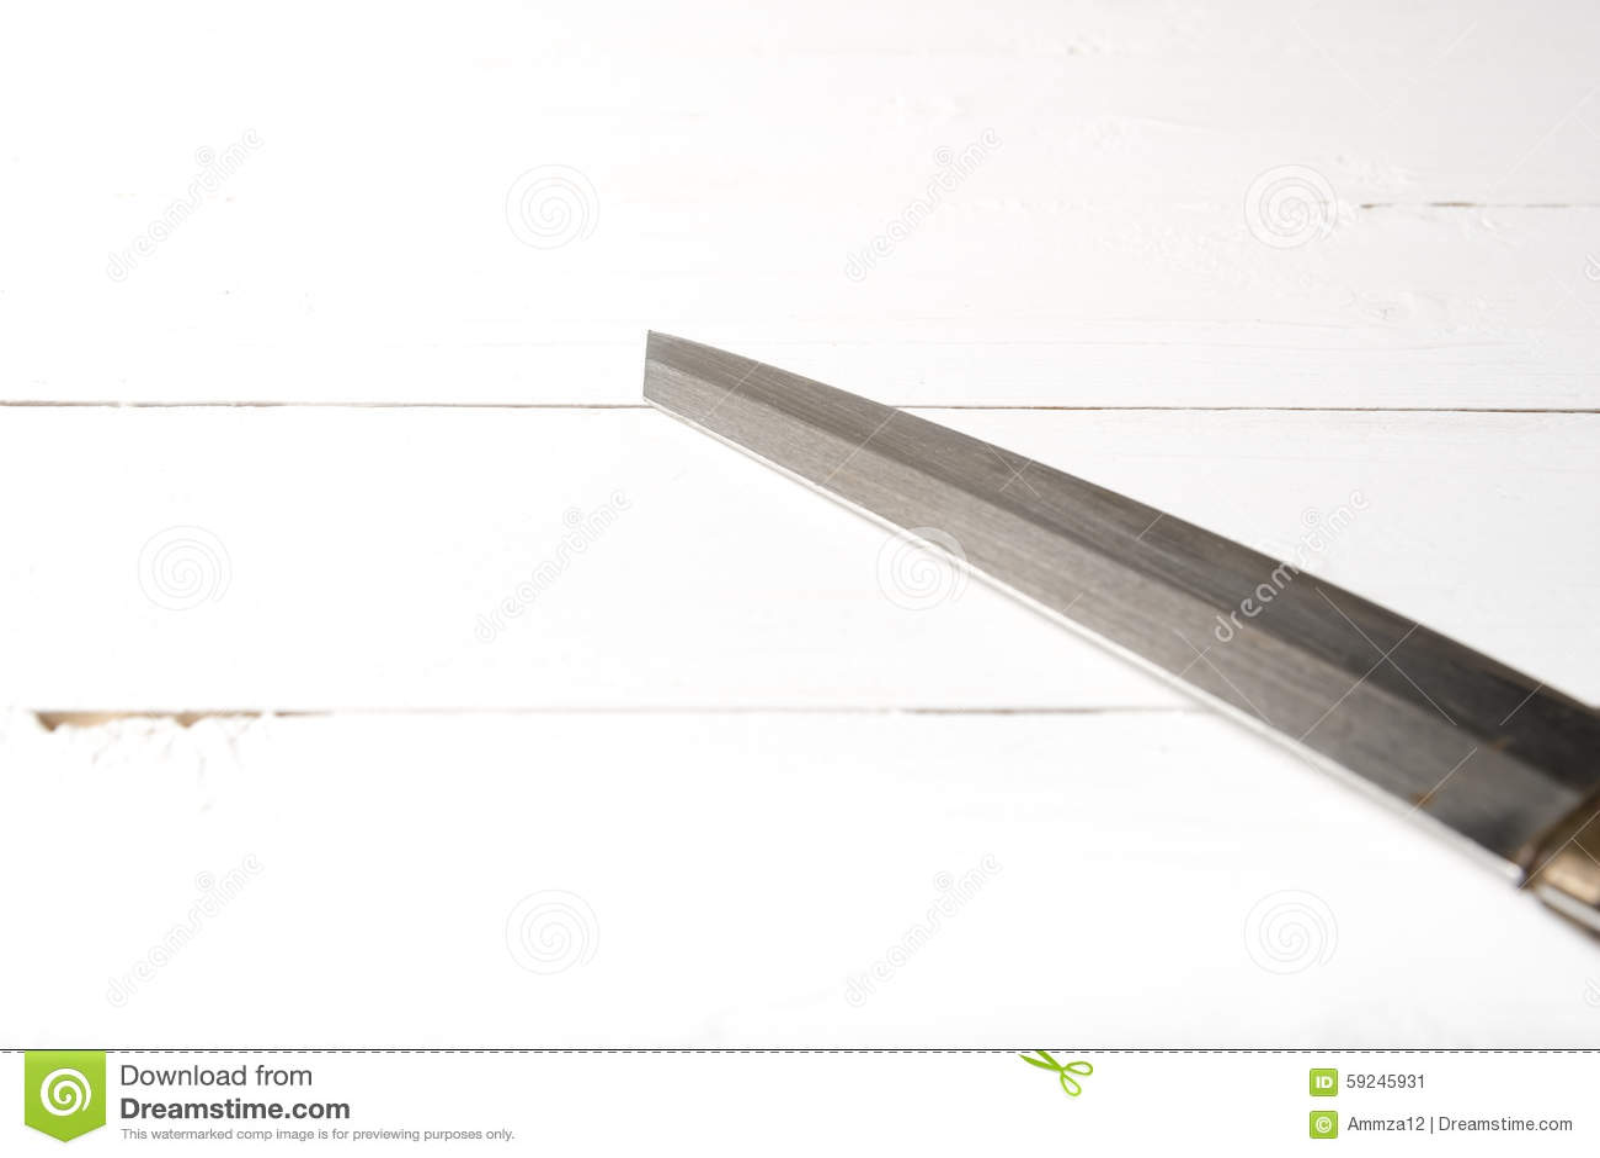 Download Cuchillo de cocina imagen de archivo. Imagen de herramienta - 59245931